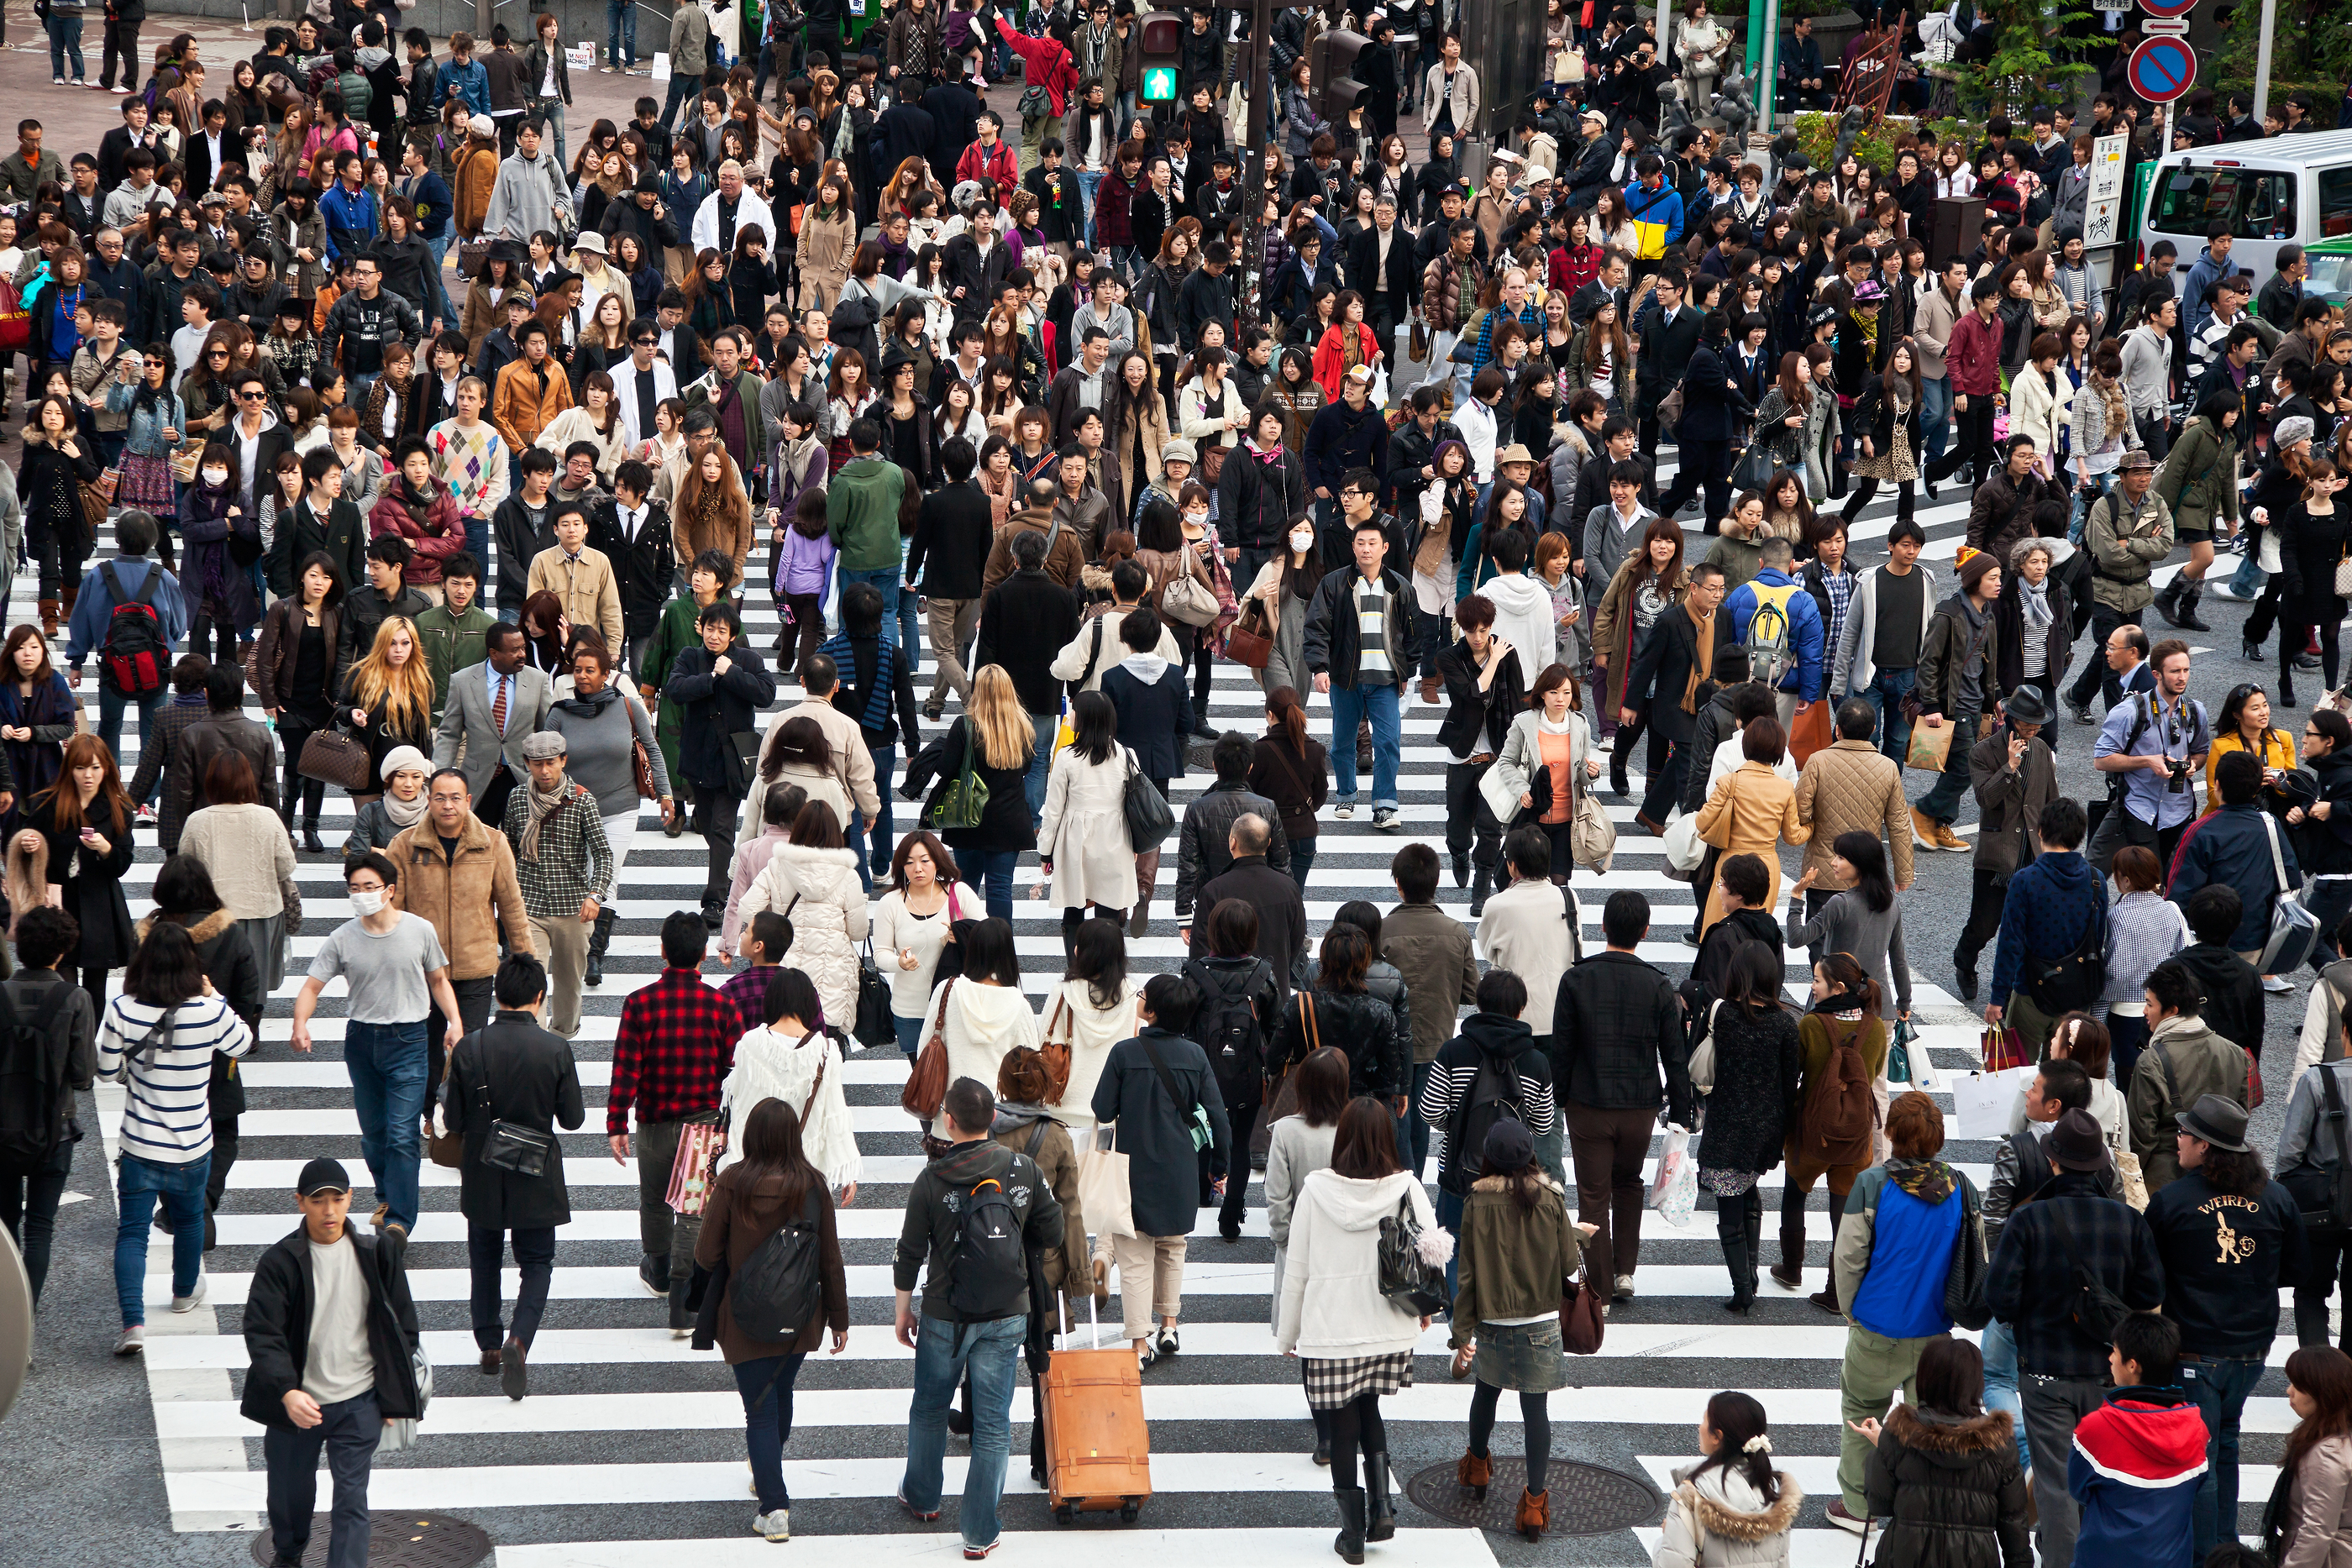 Crowd of people walking across the street